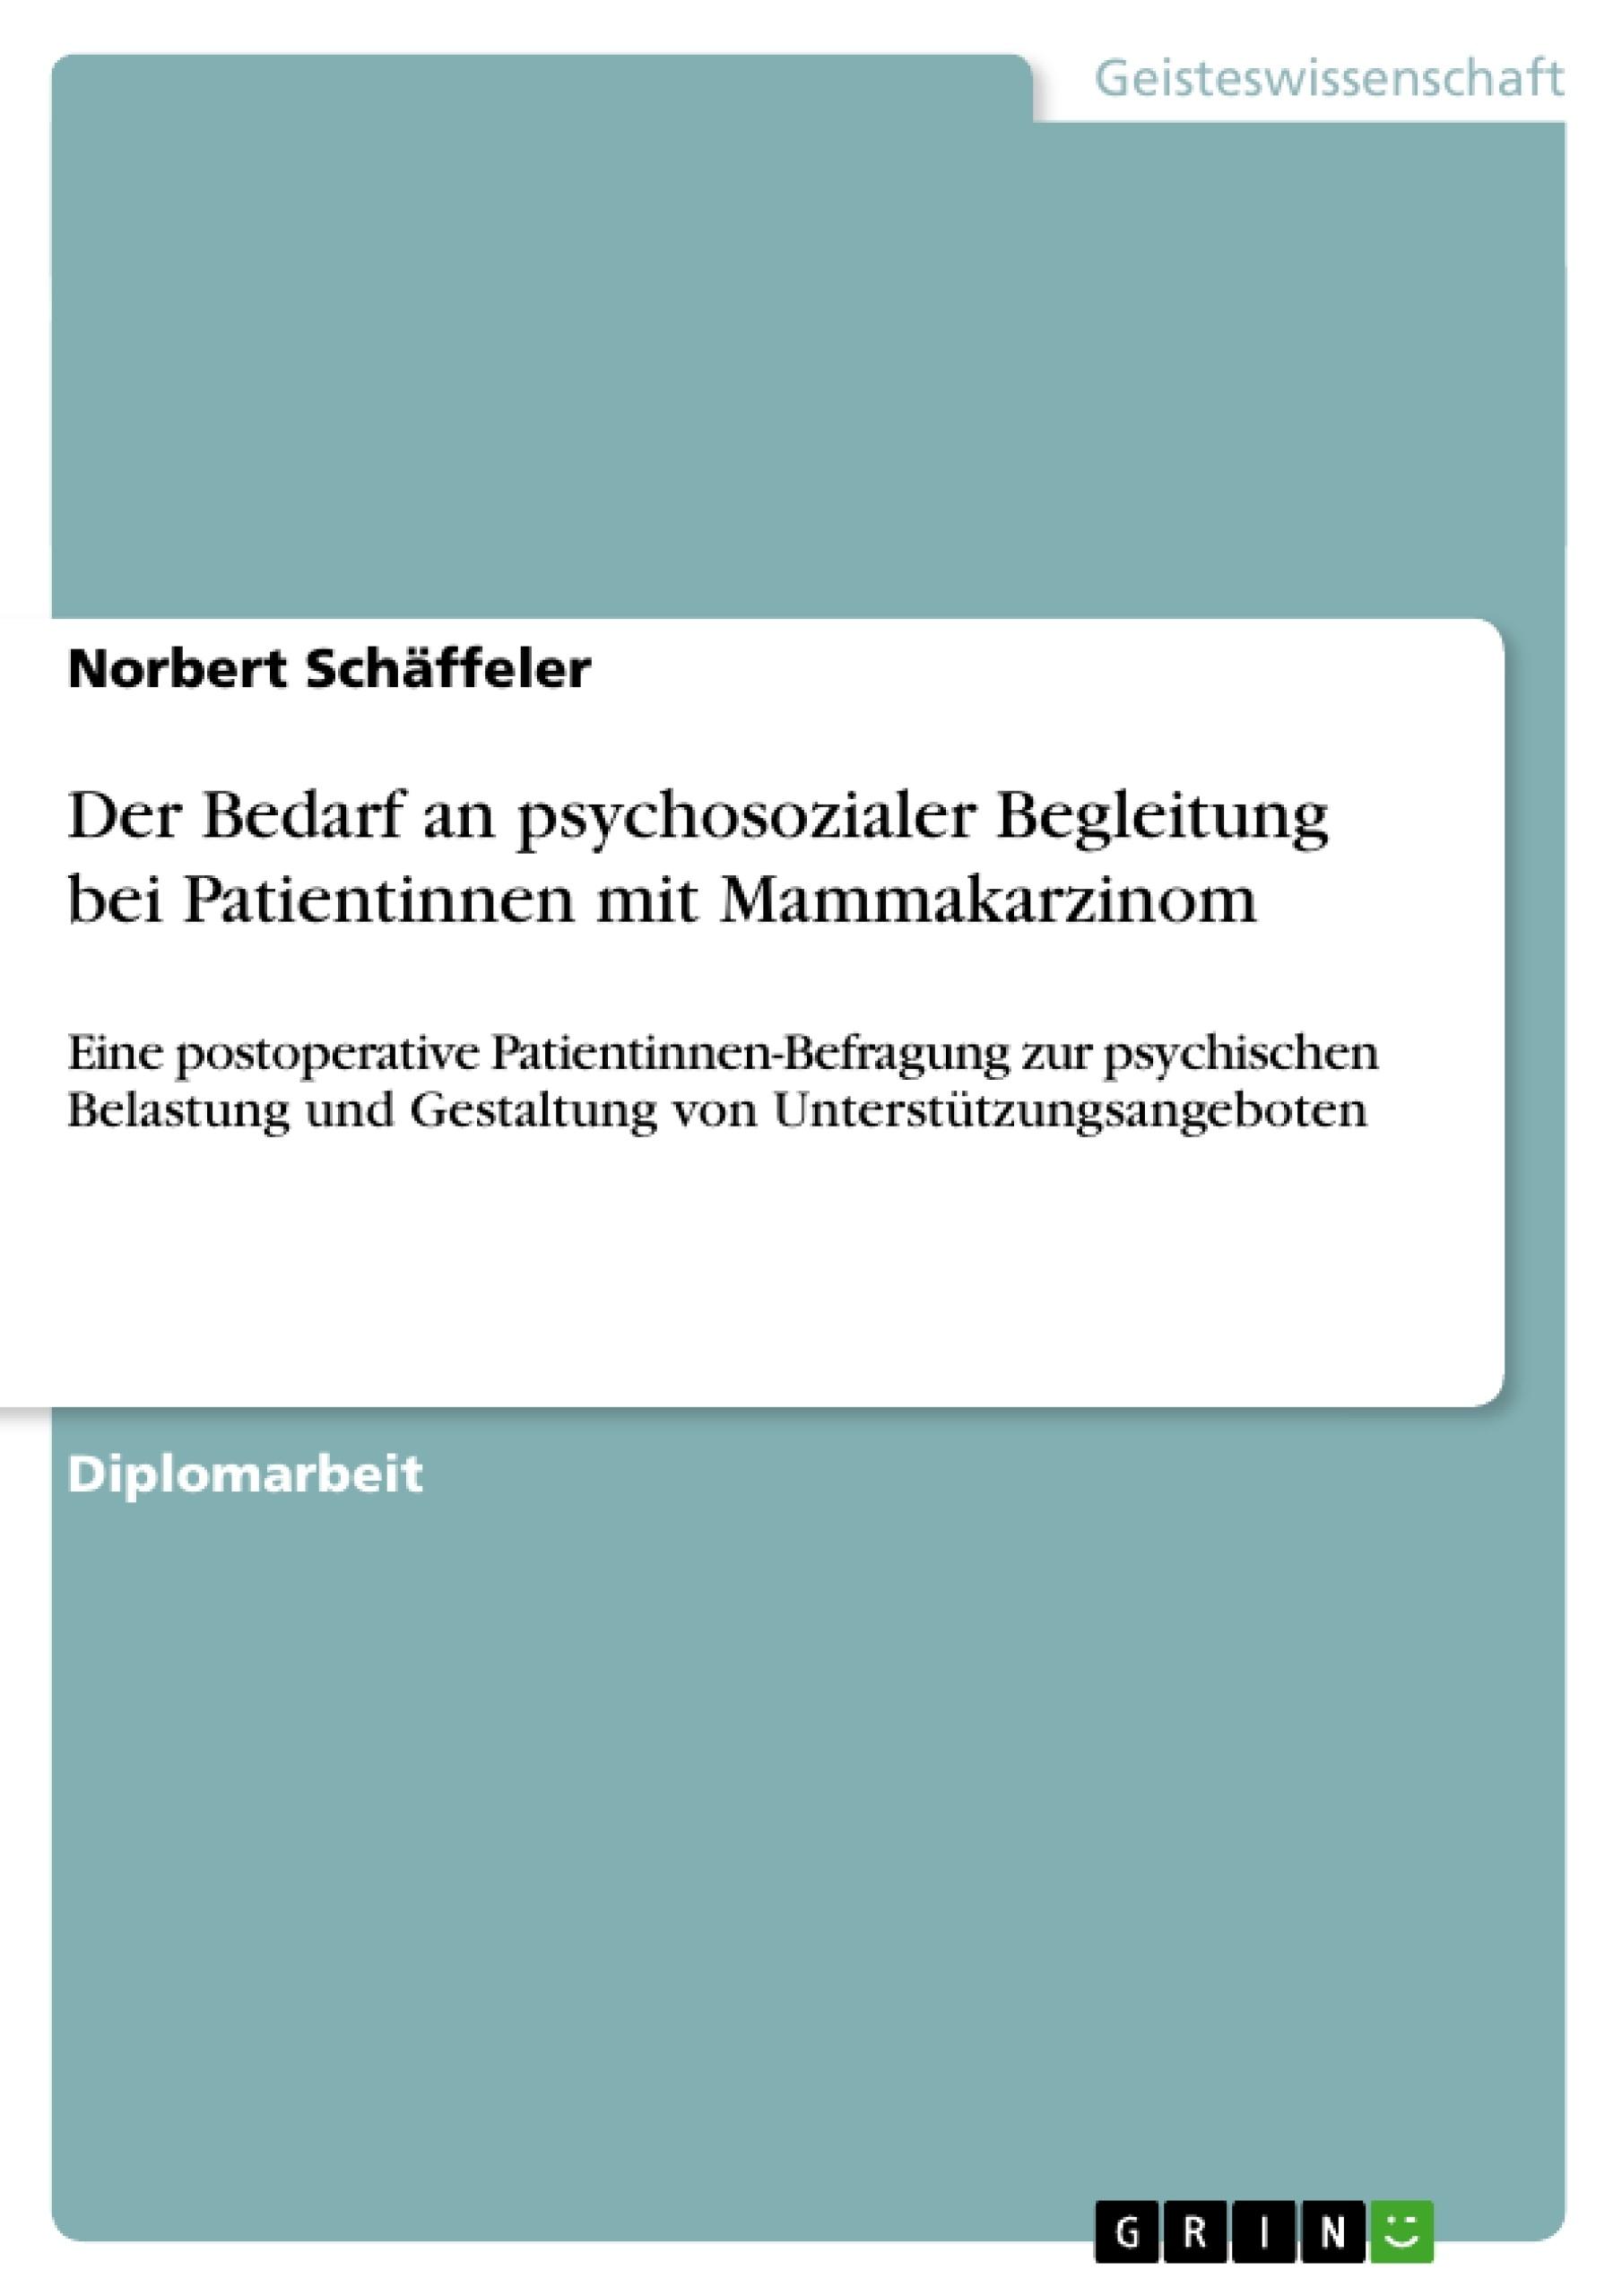 Titel: Der Bedarf an psychosozialer Begleitung bei Patientinnen mit Mammakarzinom